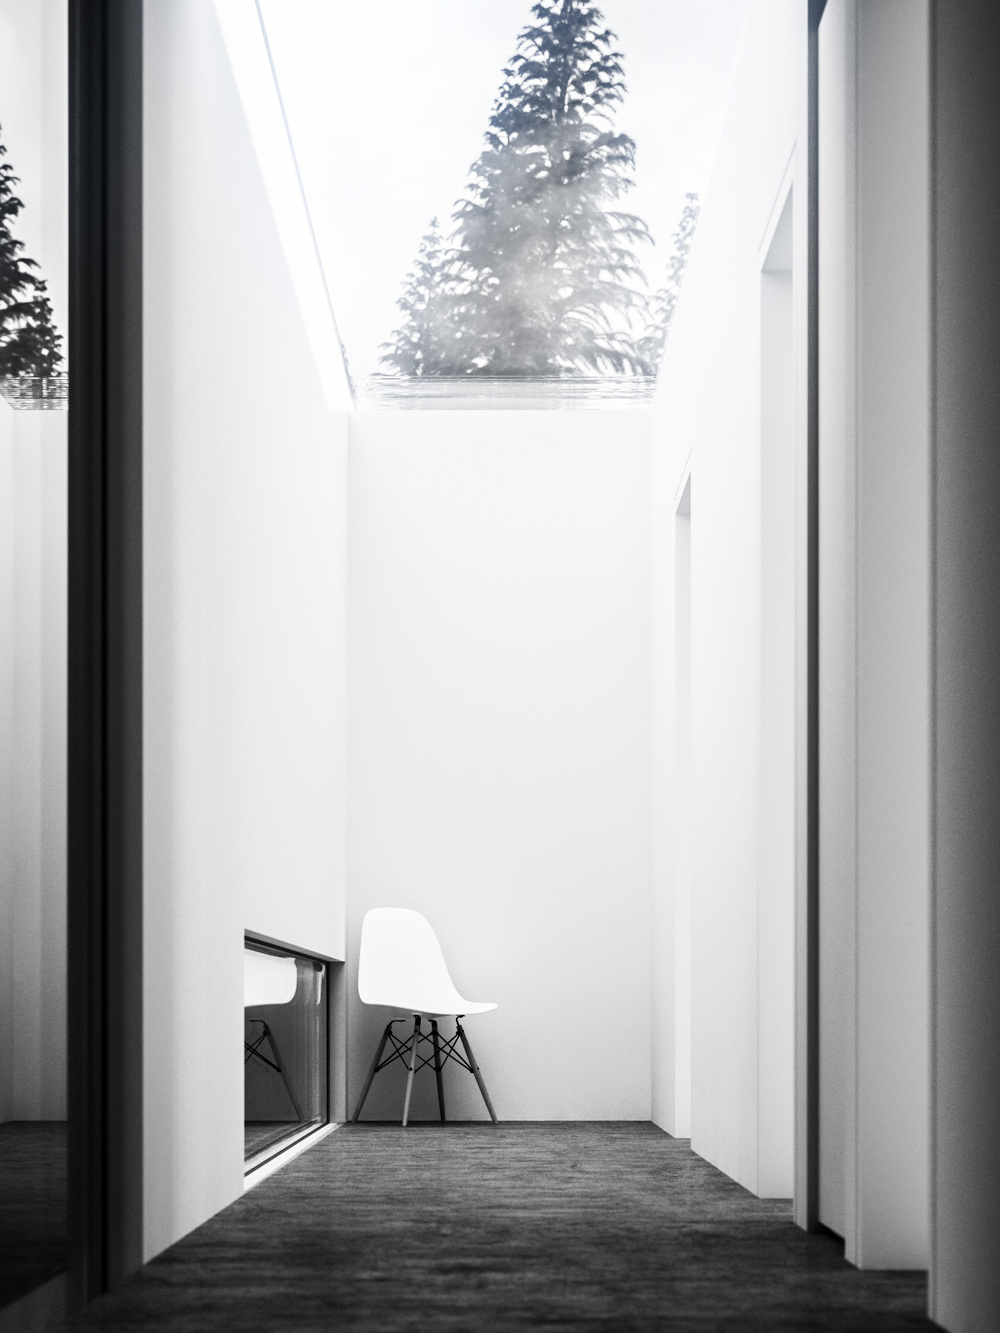 SoA-JeroenHenning_Interior0002_BW.jpg